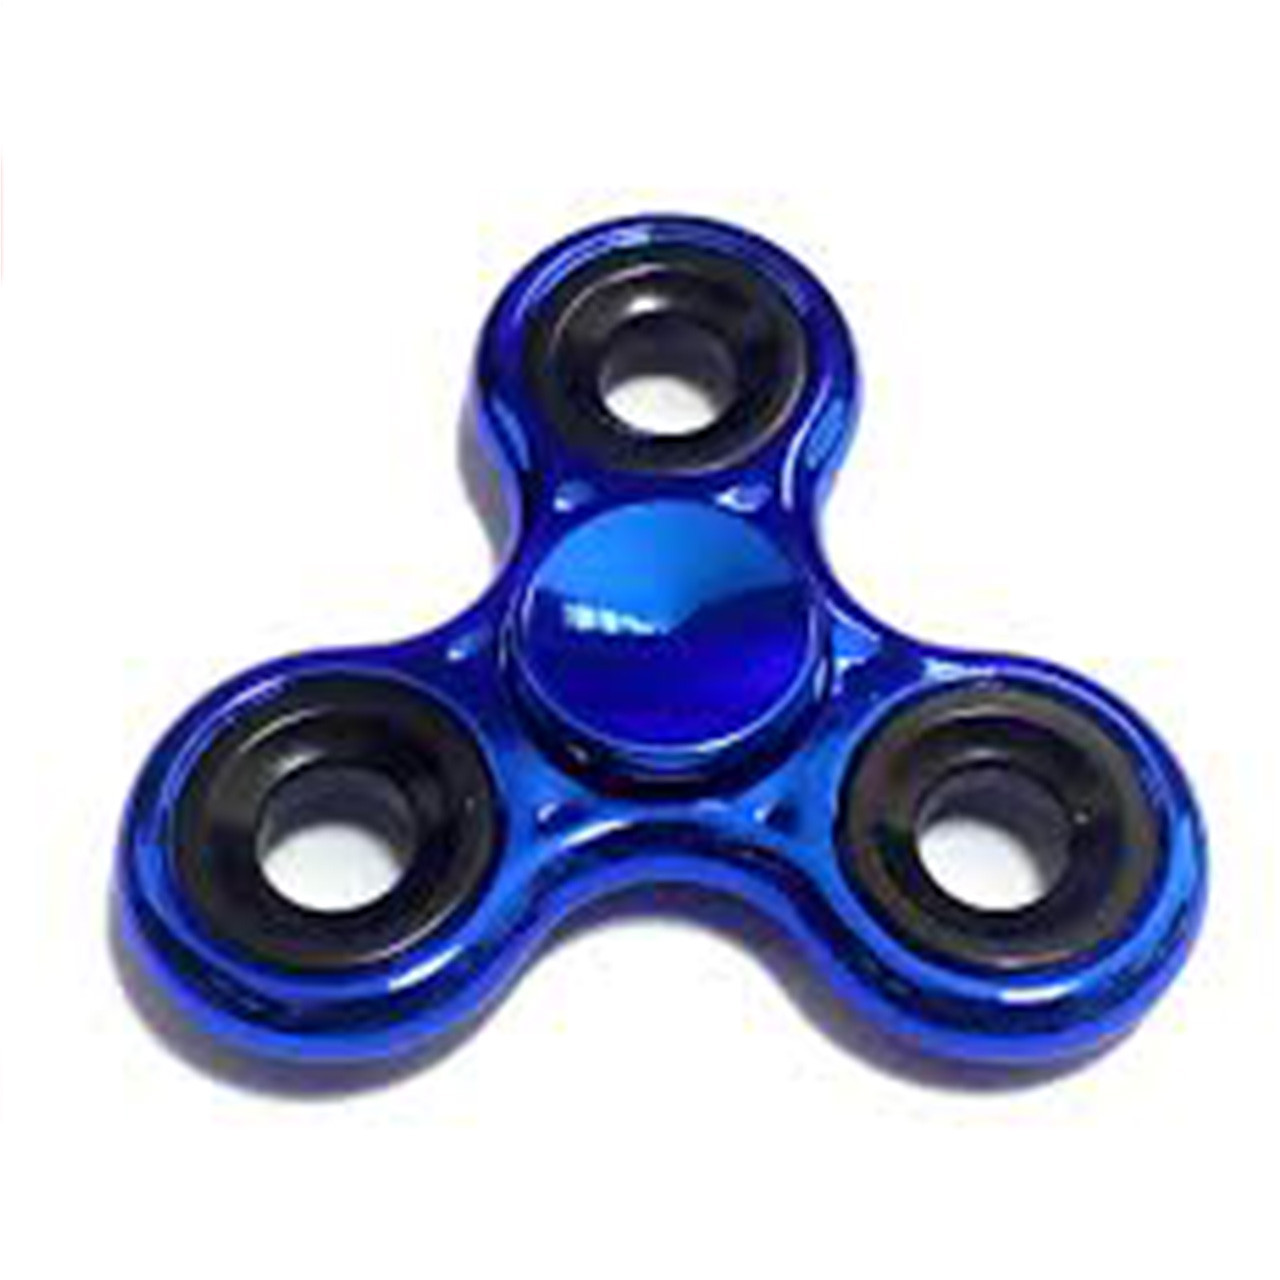 Спиннер Spinner 4.4 Синий